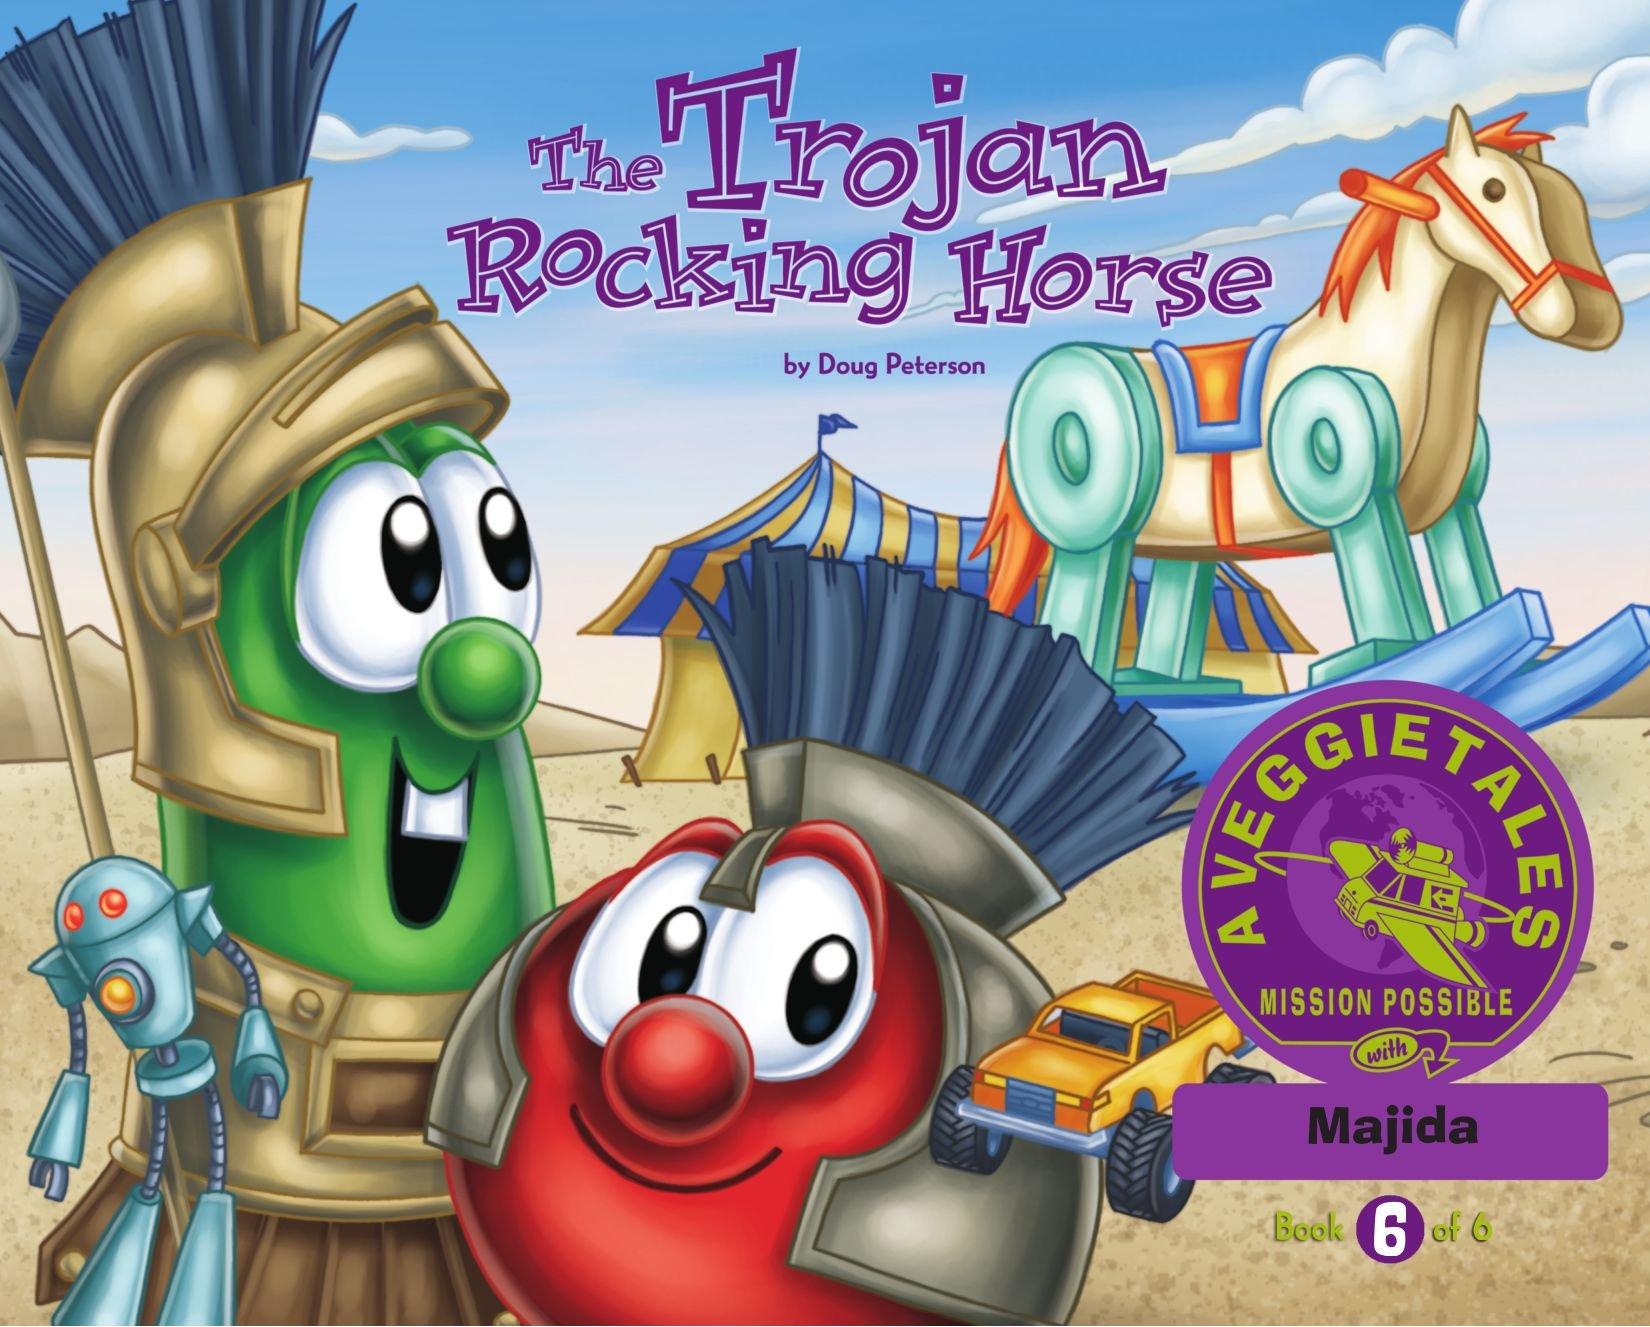 Read Online The Trojan Rocking Horse - VeggieTales Mission Possible Adventure Series #6: Personalized for Majida (Boy) pdf epub